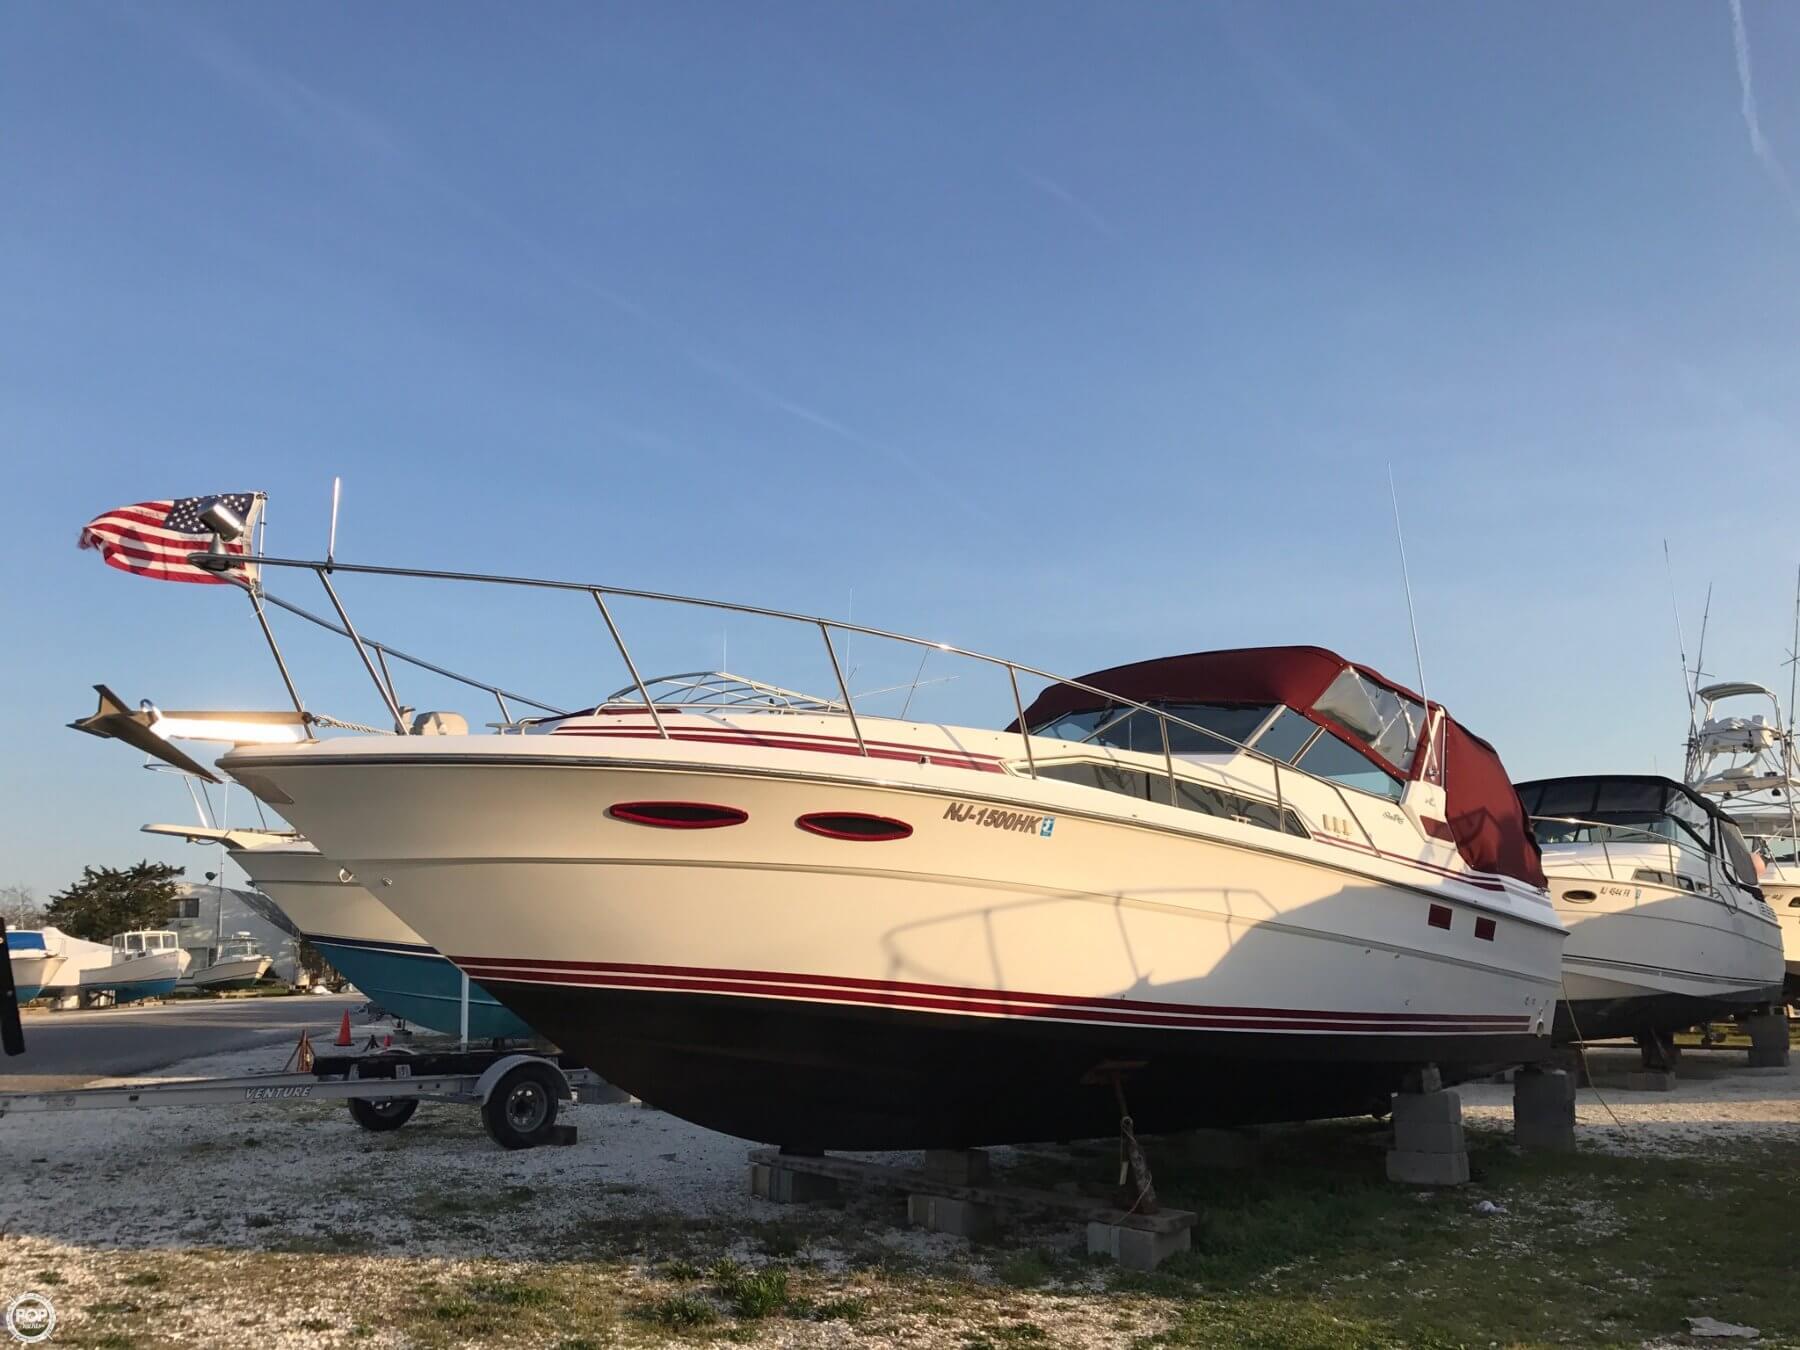 sea ray warranty turn signal switch wiring diagram canceled 340 sundancer boat in cape may nj 113858